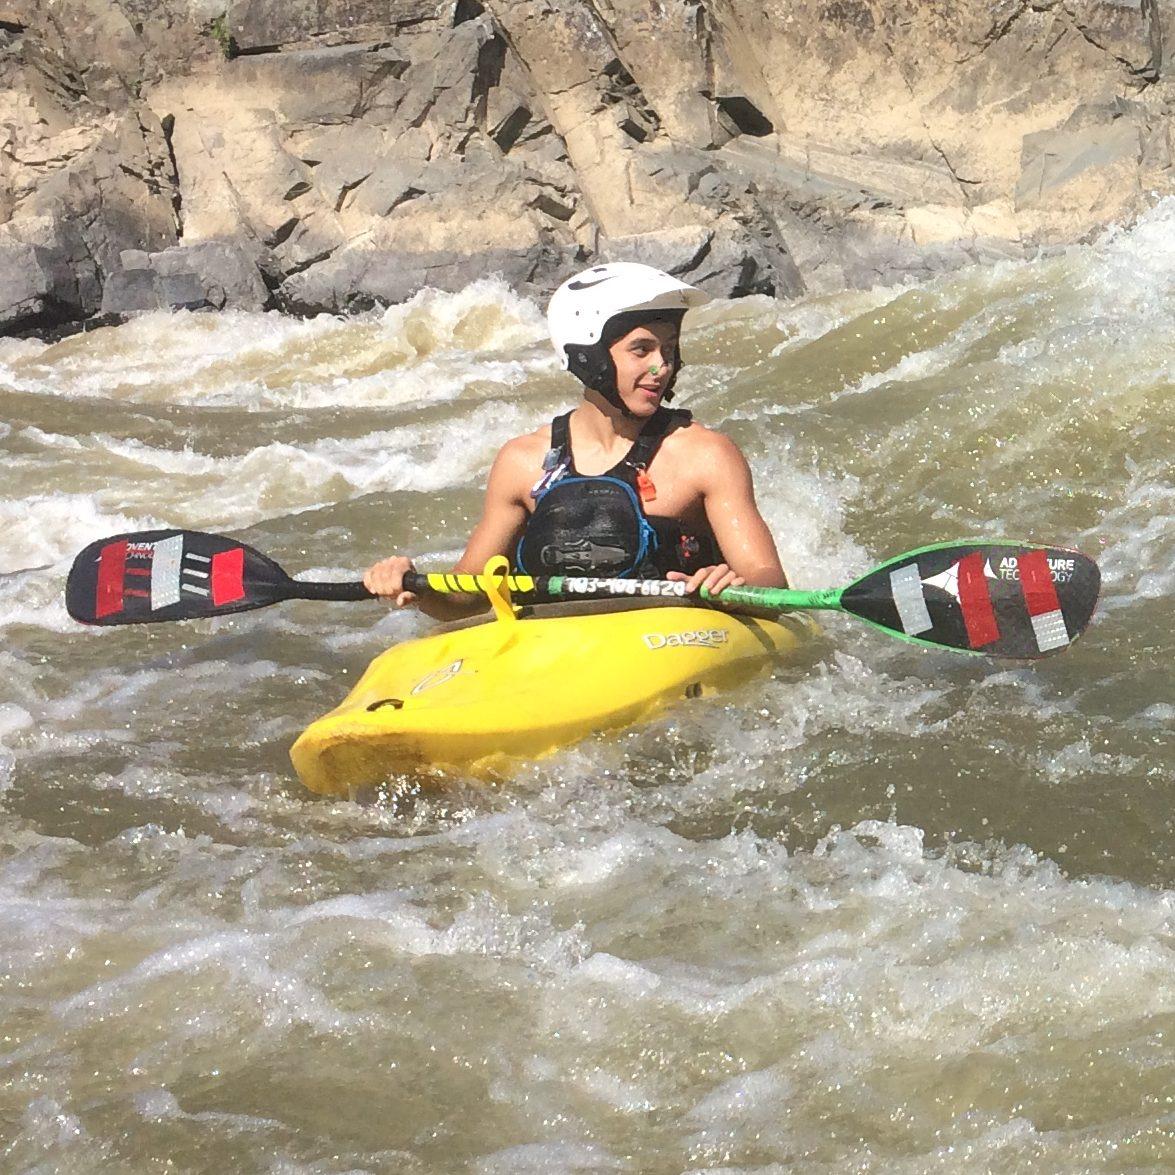 Dagger axiom surfing great falls Kayak lessons at Calleva